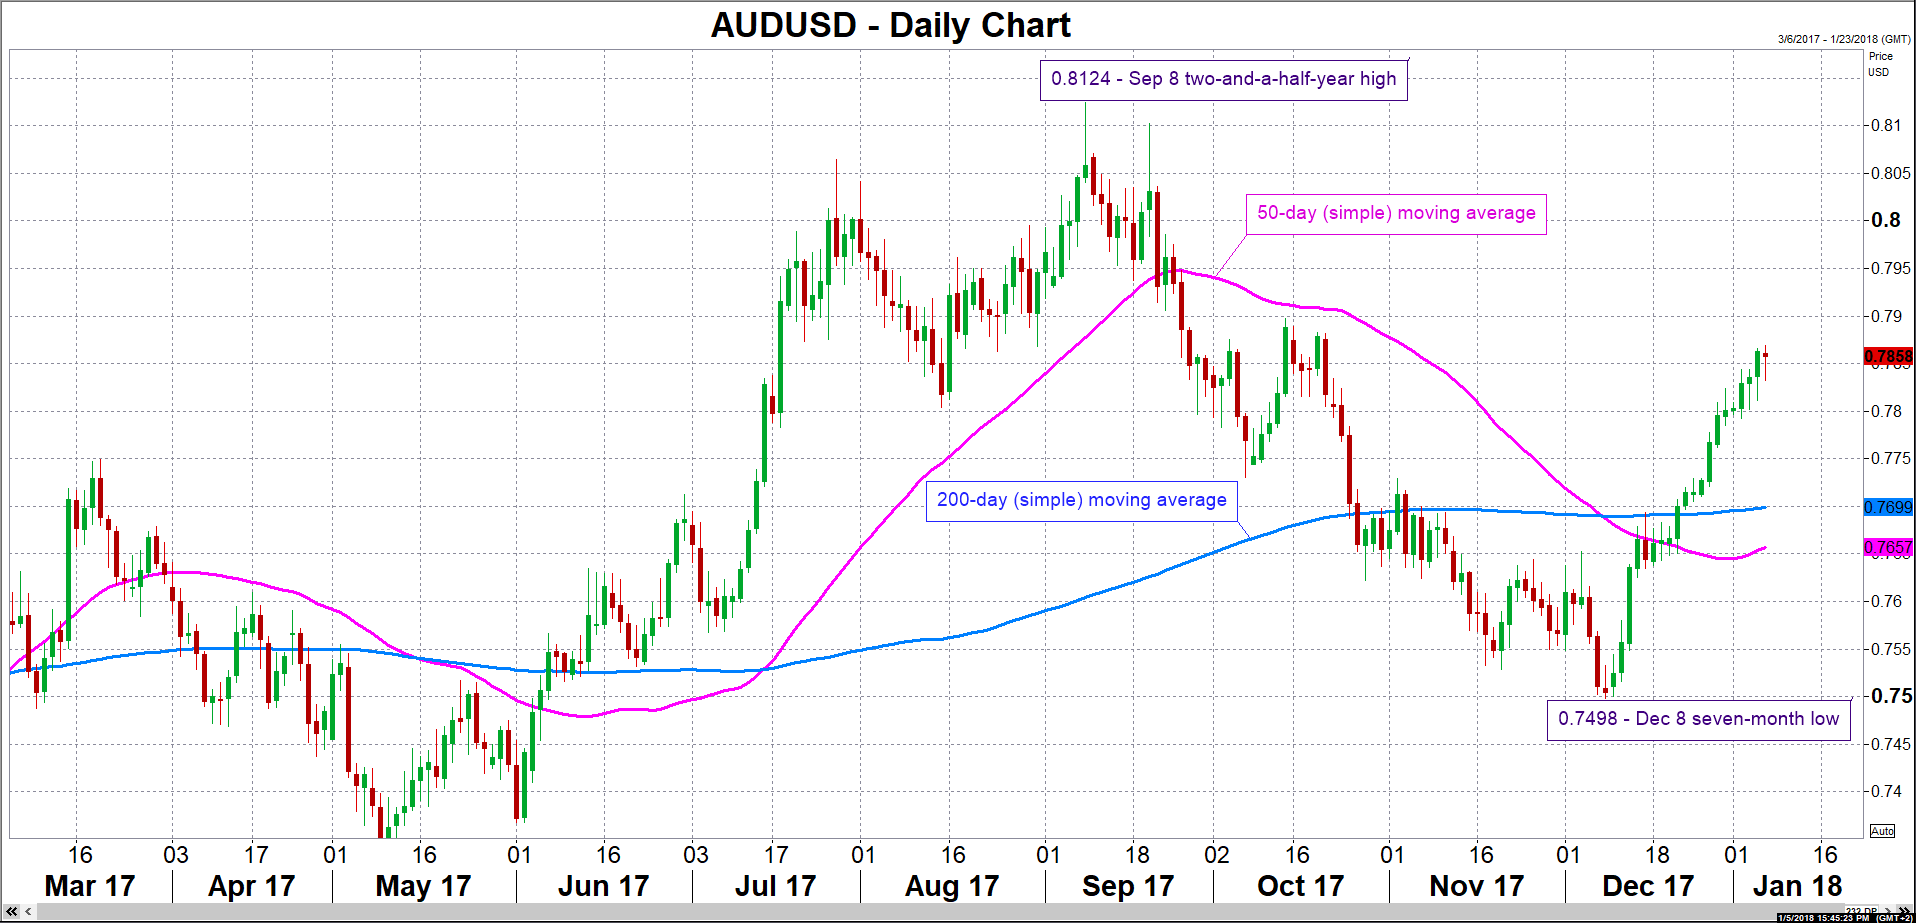 AUD/USD 05/01/2018 | Econ Alerts